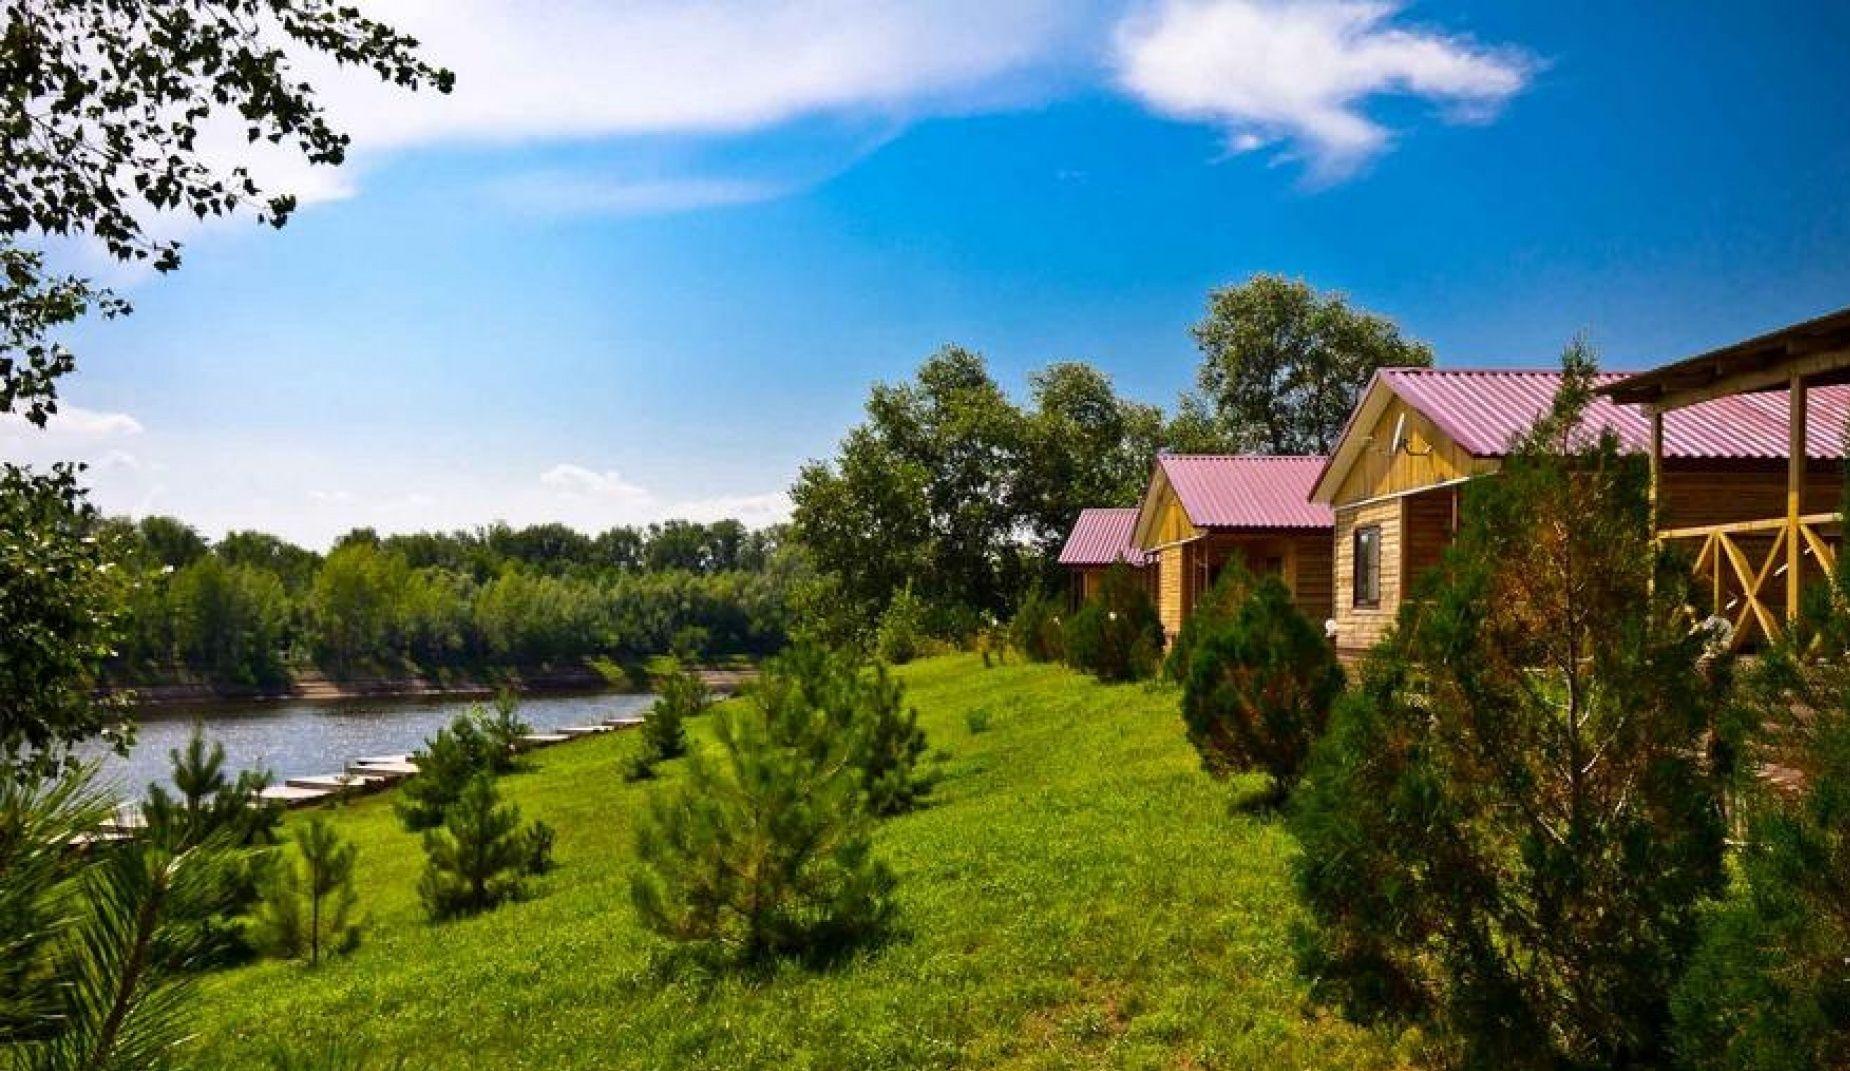 River club «Летучая рыба» Волгоградская область, фото 1